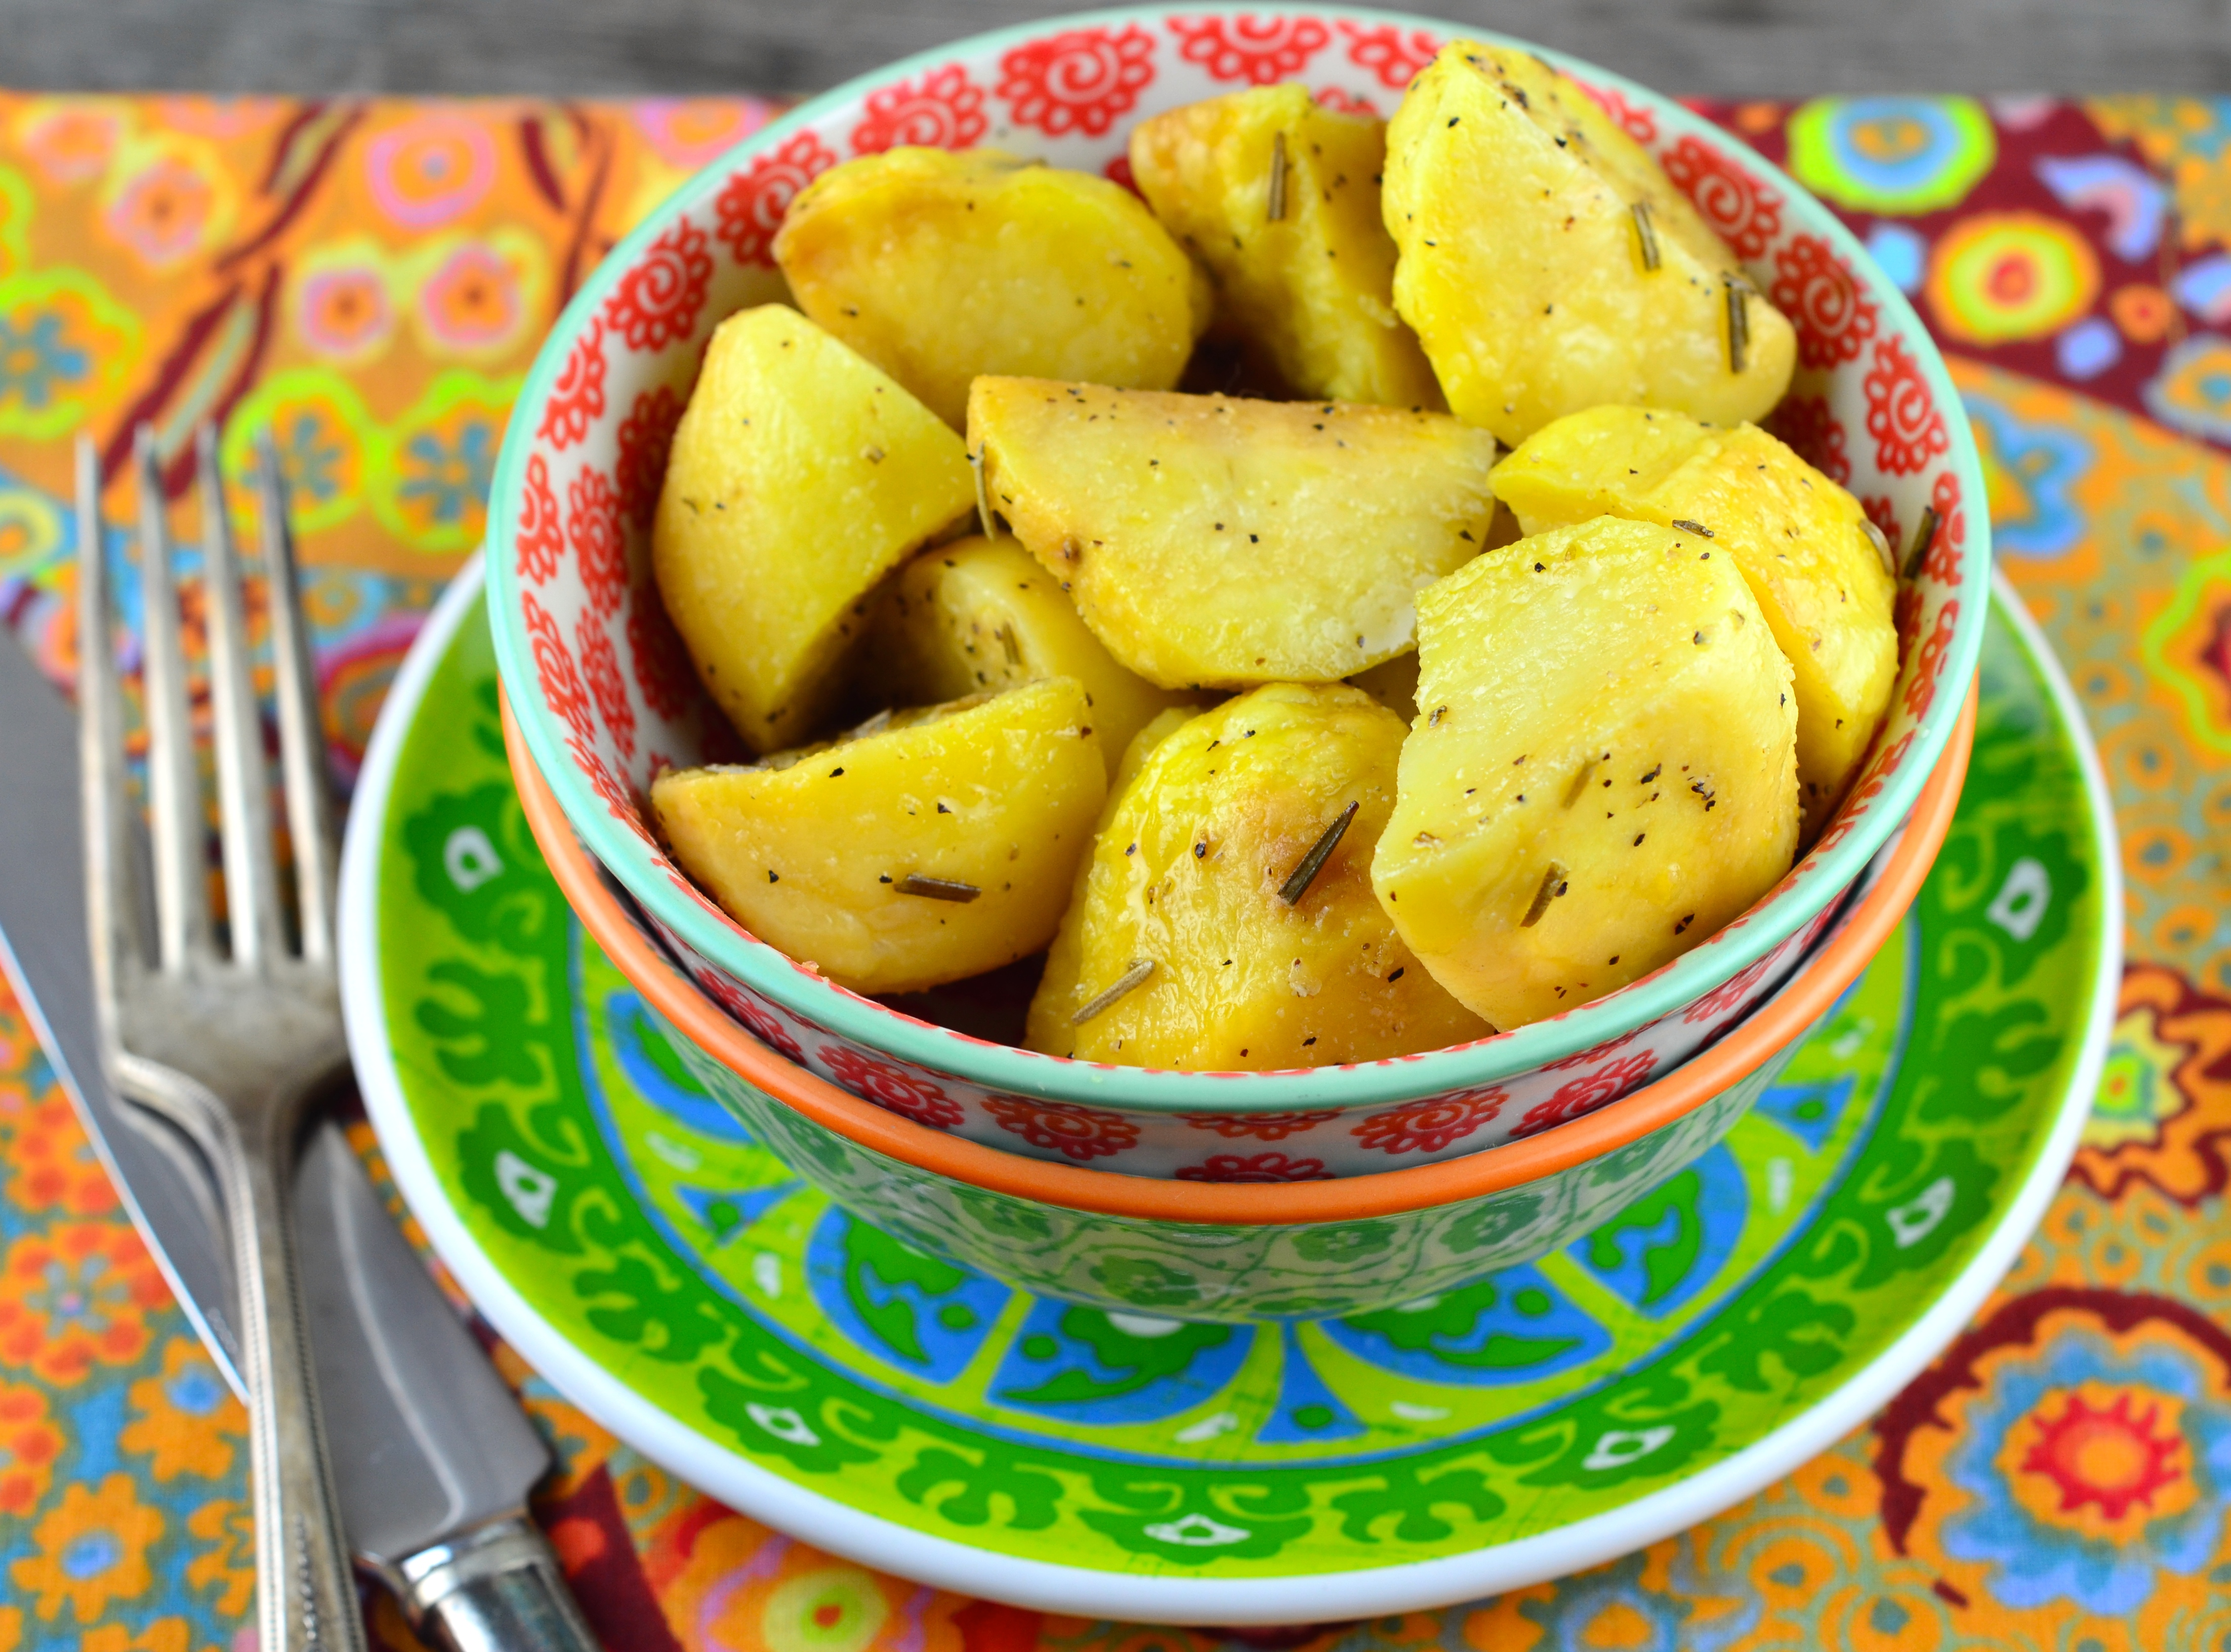 Rosemary Potatoes – Microwave